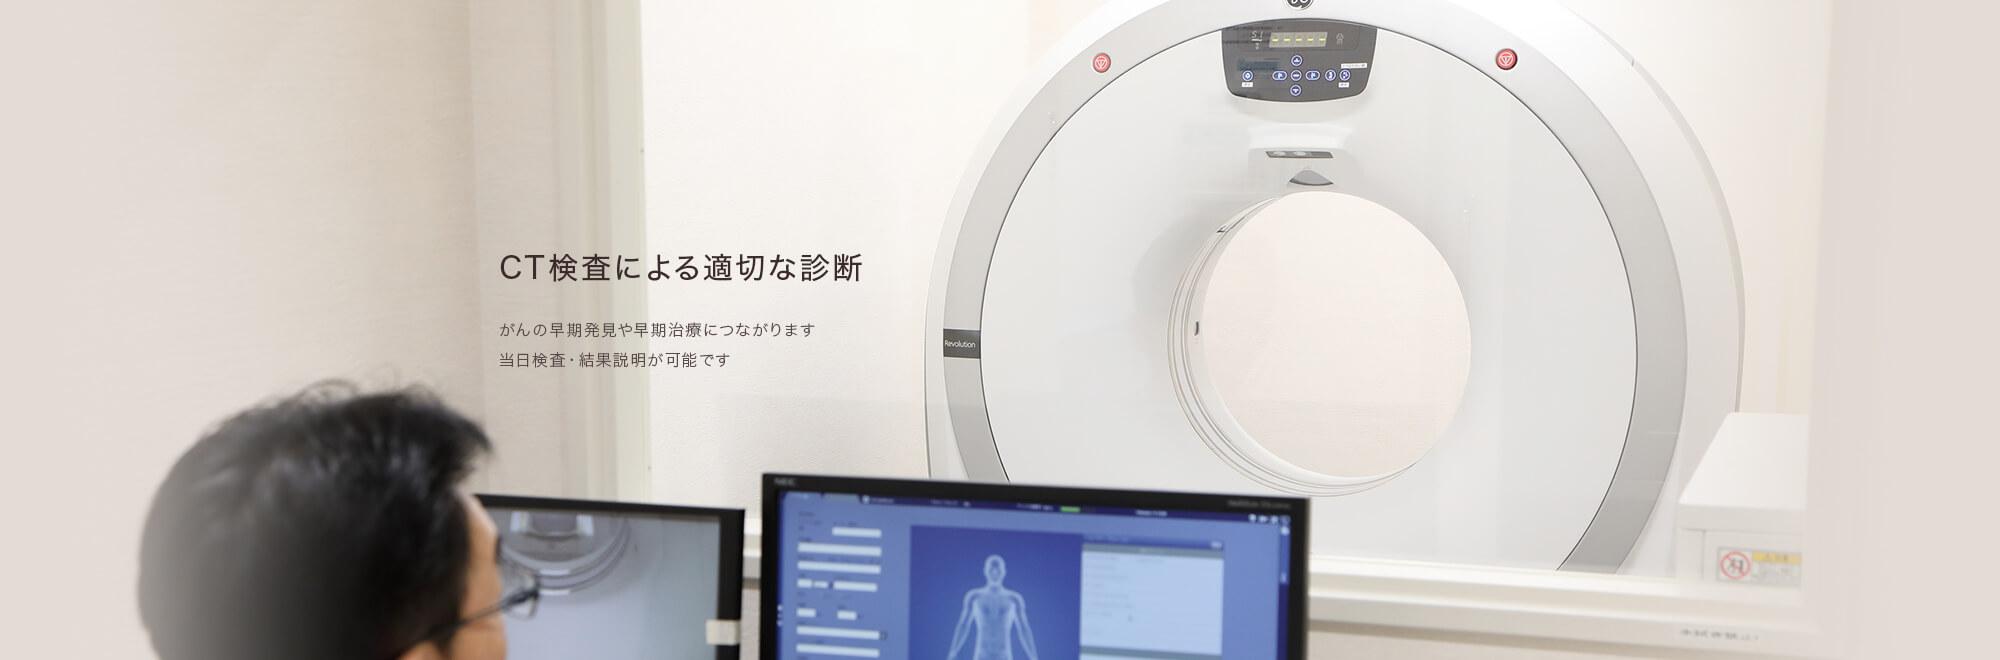 CT検査による適切な診断 がんの早期発見や早期治療につながります 当日検査・結果説明が可能です